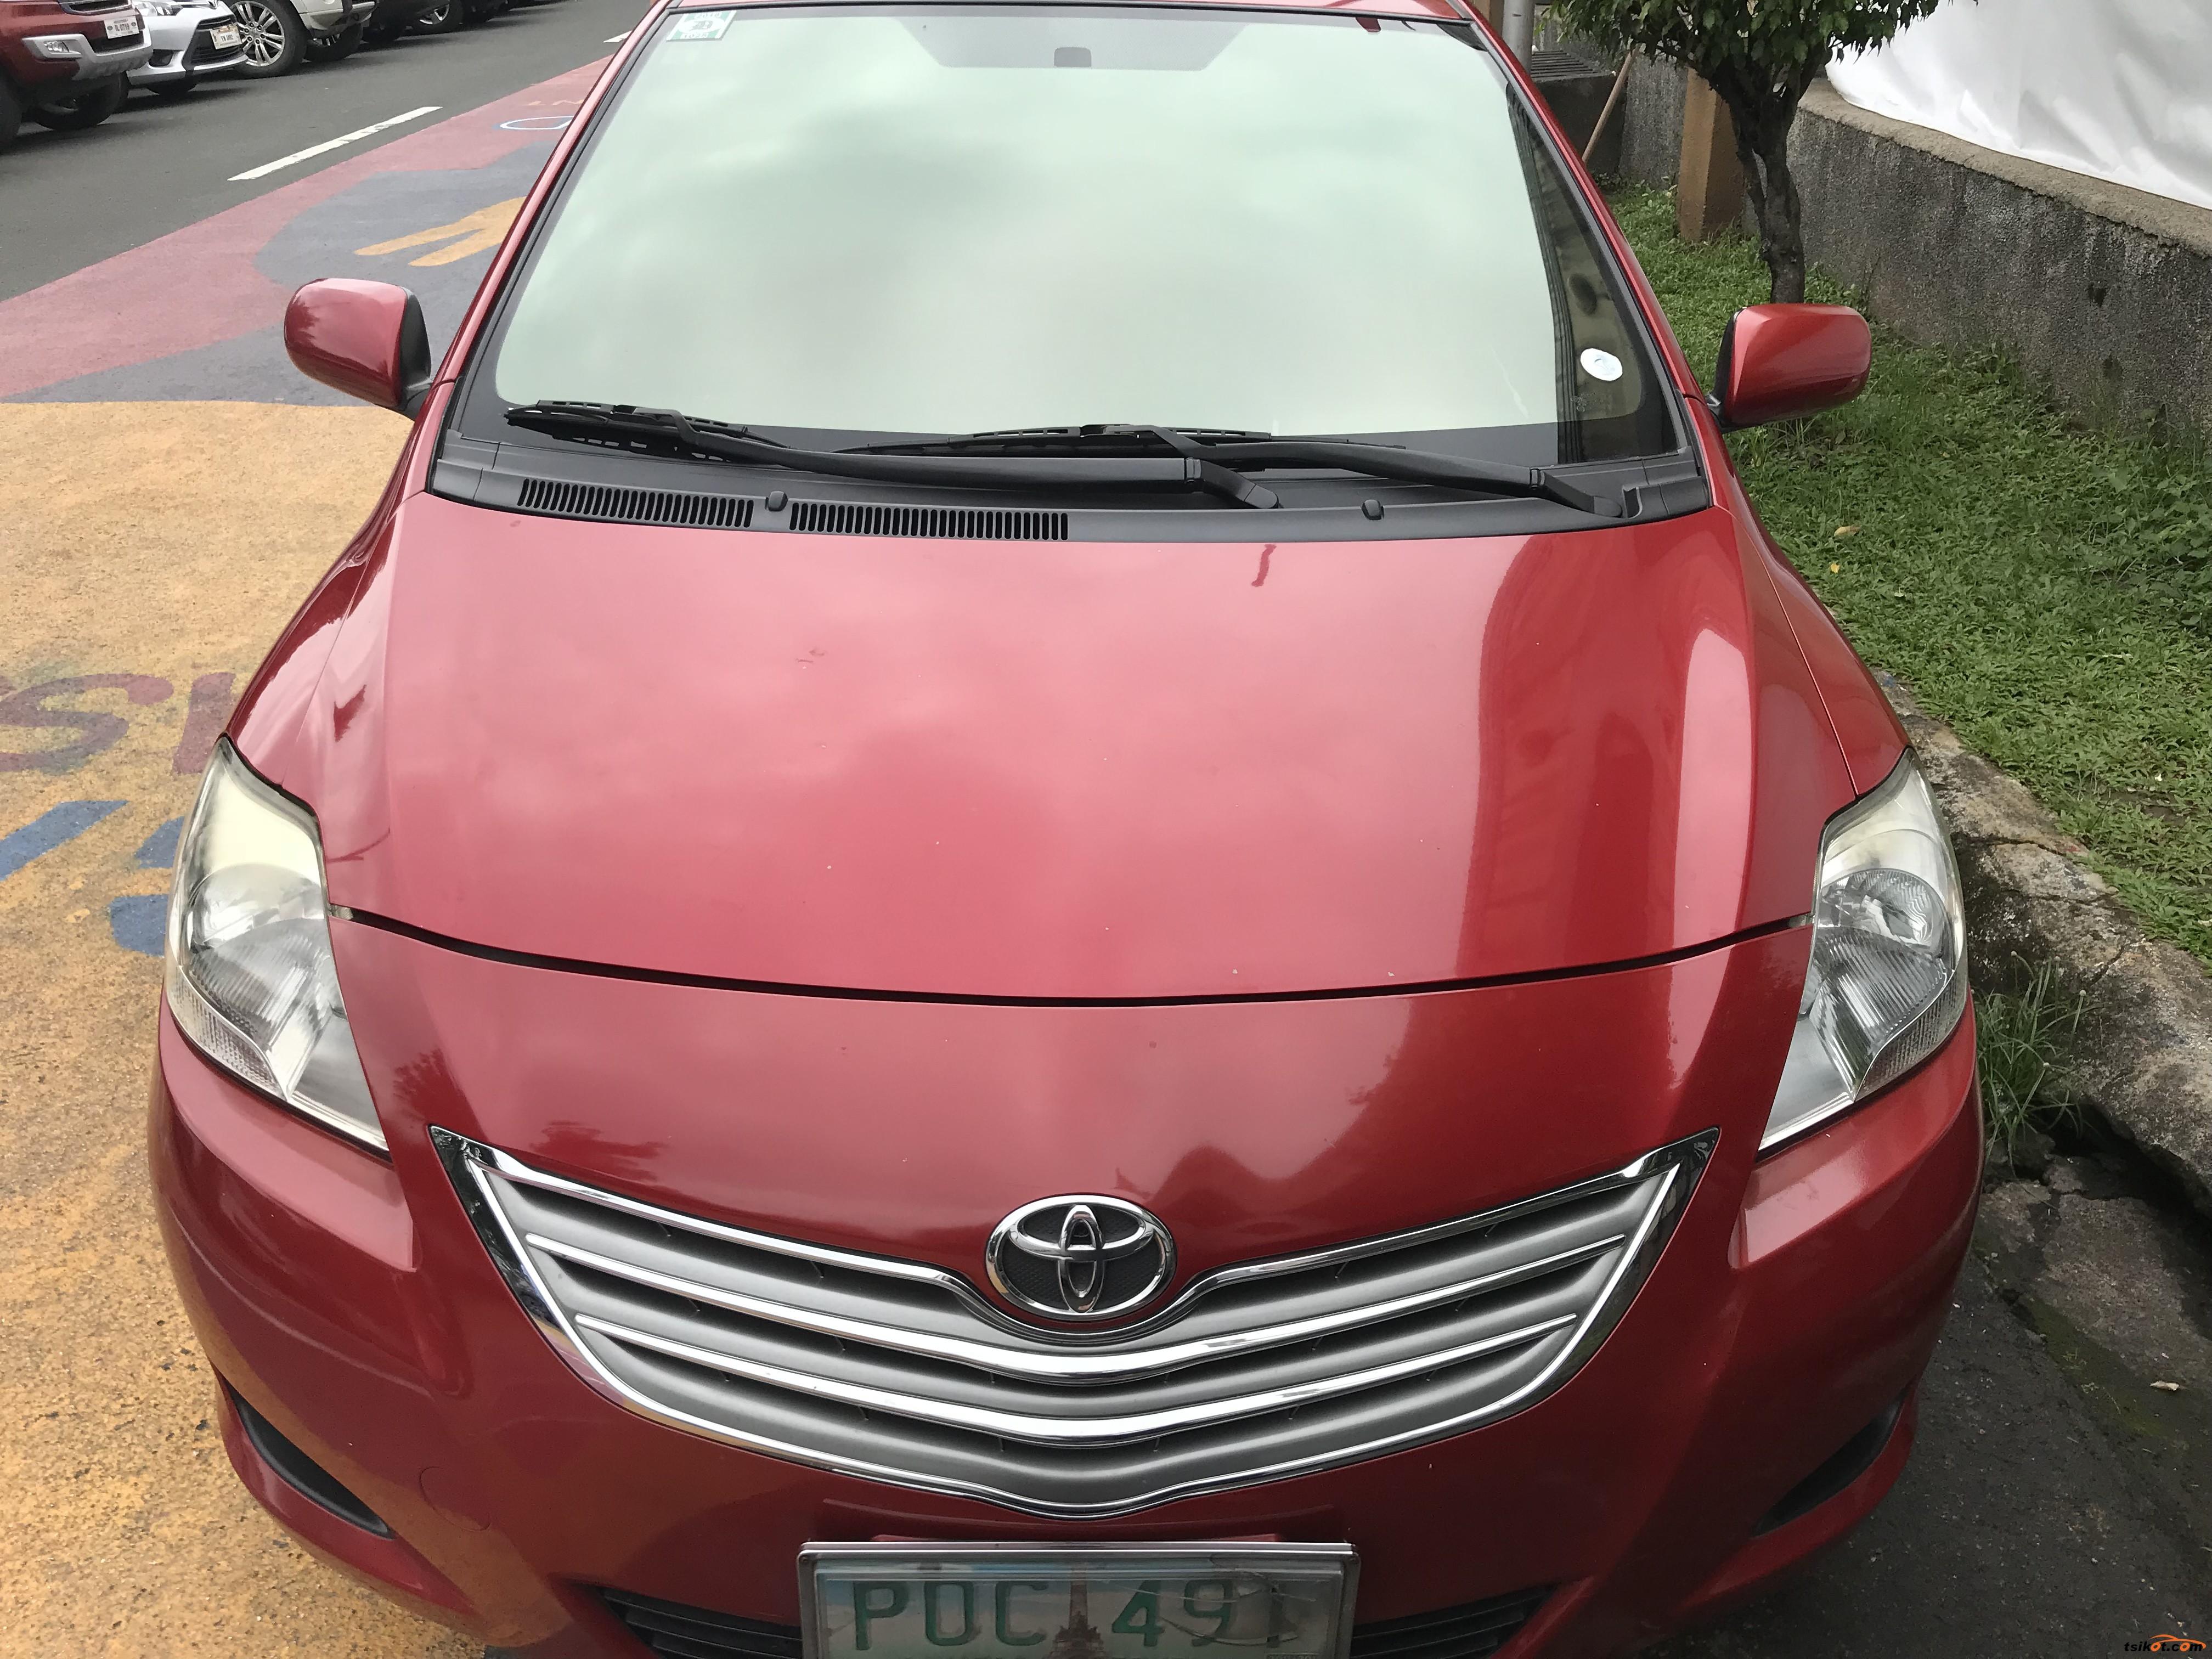 Toyota Vios 2011 - 8